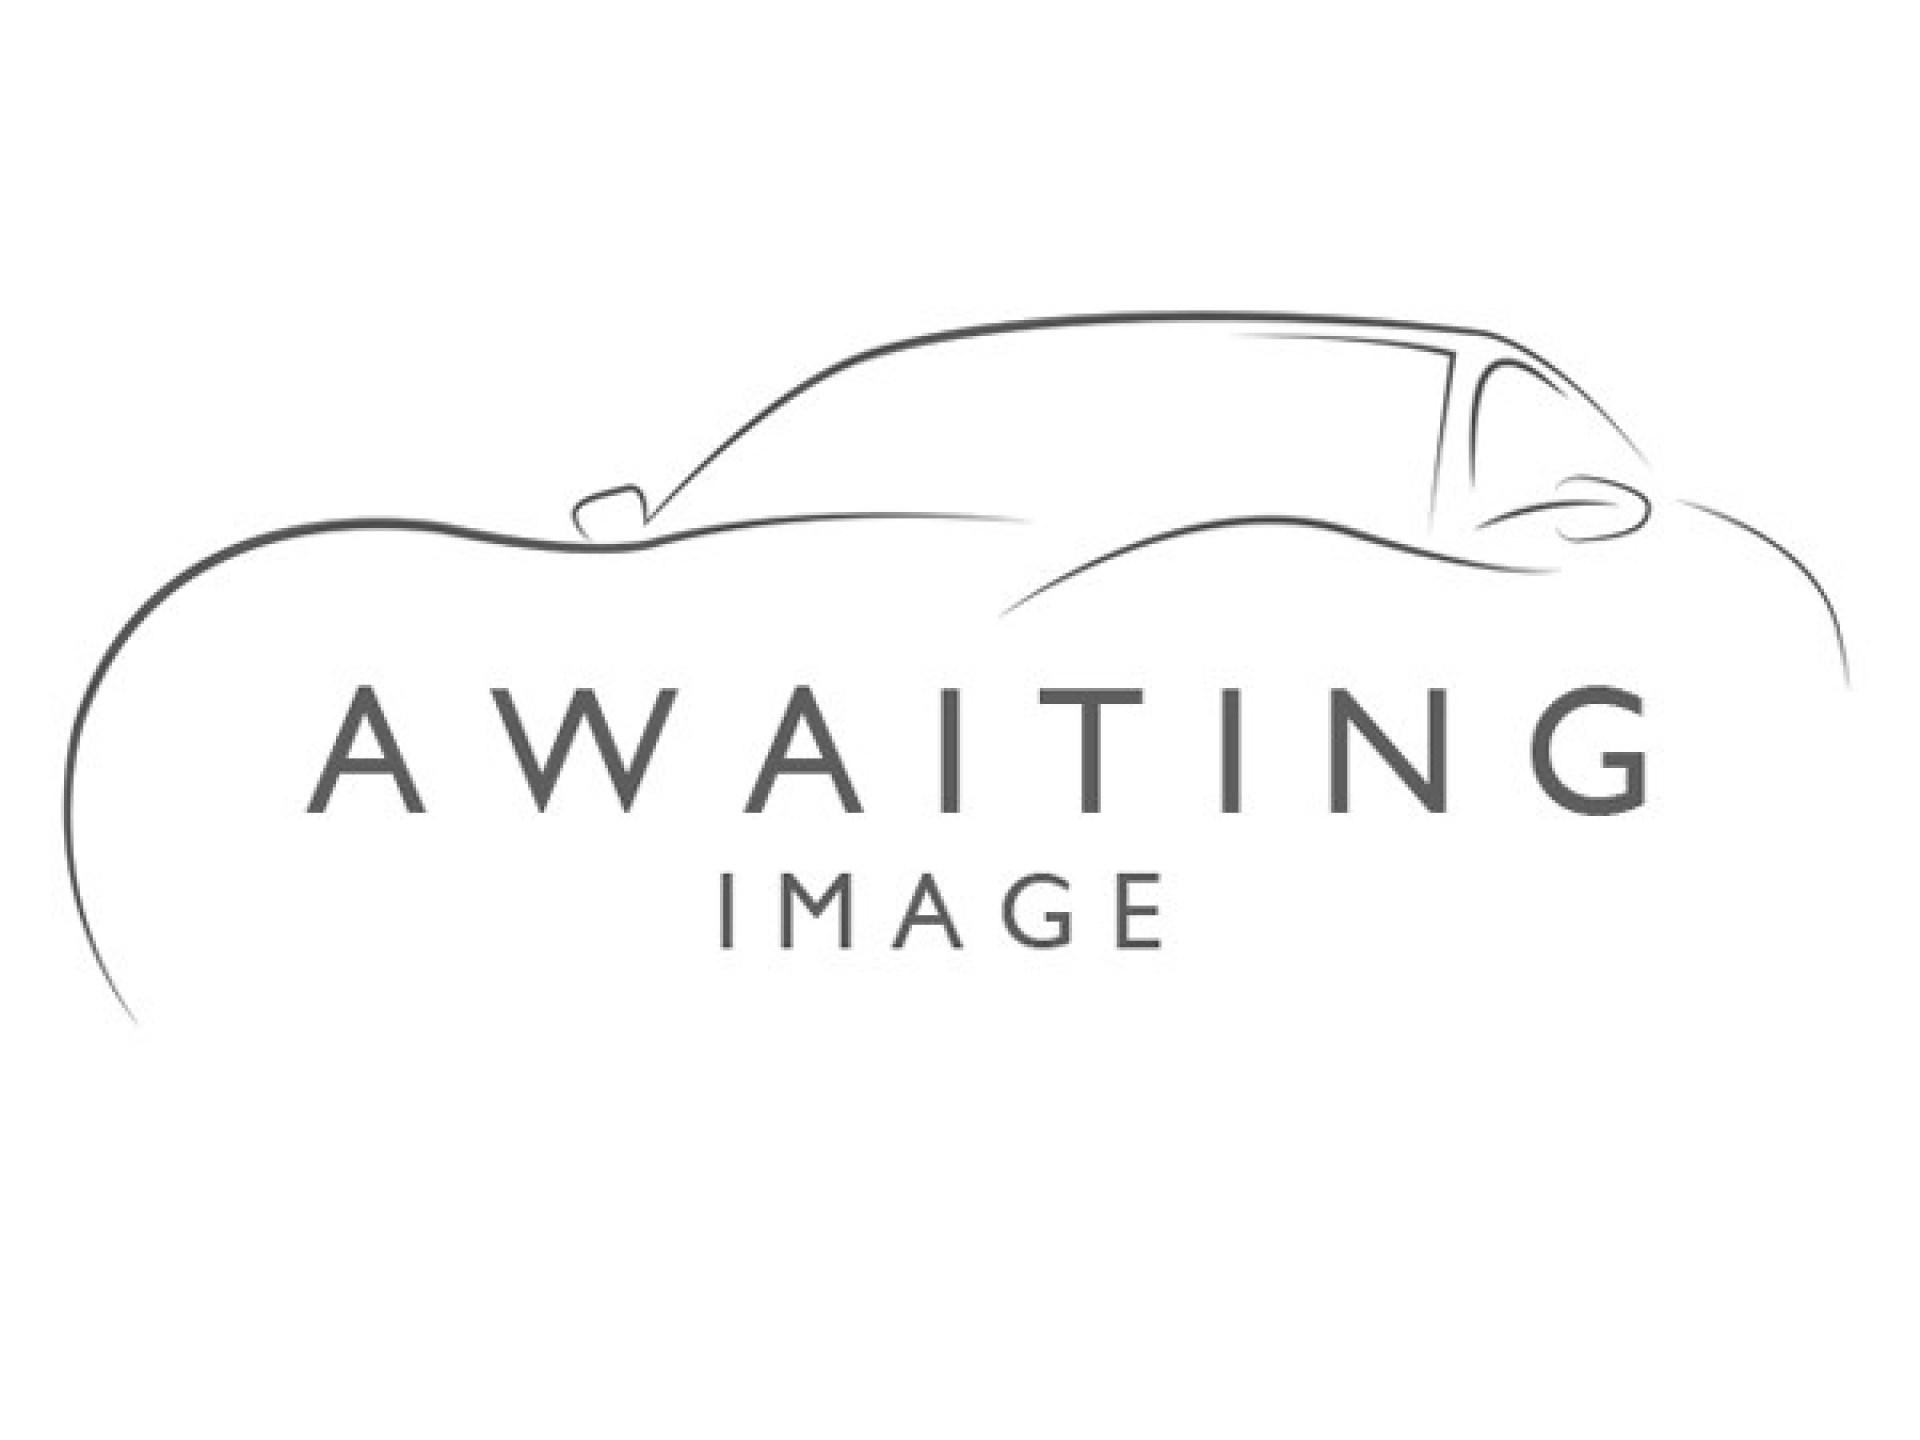 Used Lexus IS 200 2 0 SE Auto 4 Doors Saloon for sale in Blackwood